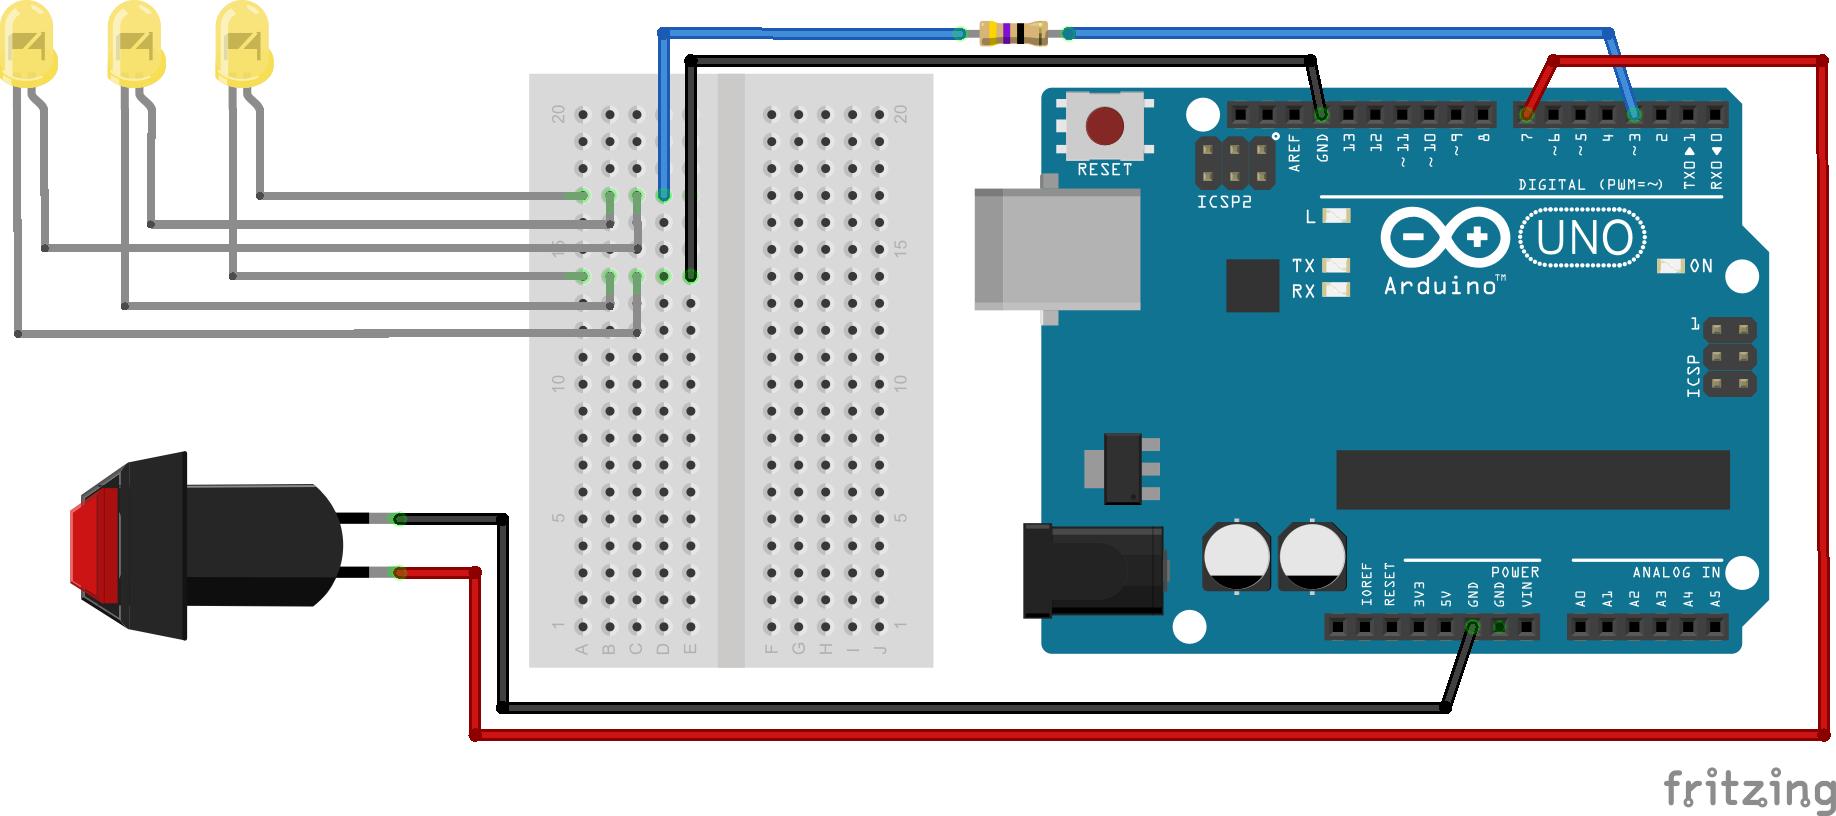 Night light using arduino - Functionality Description